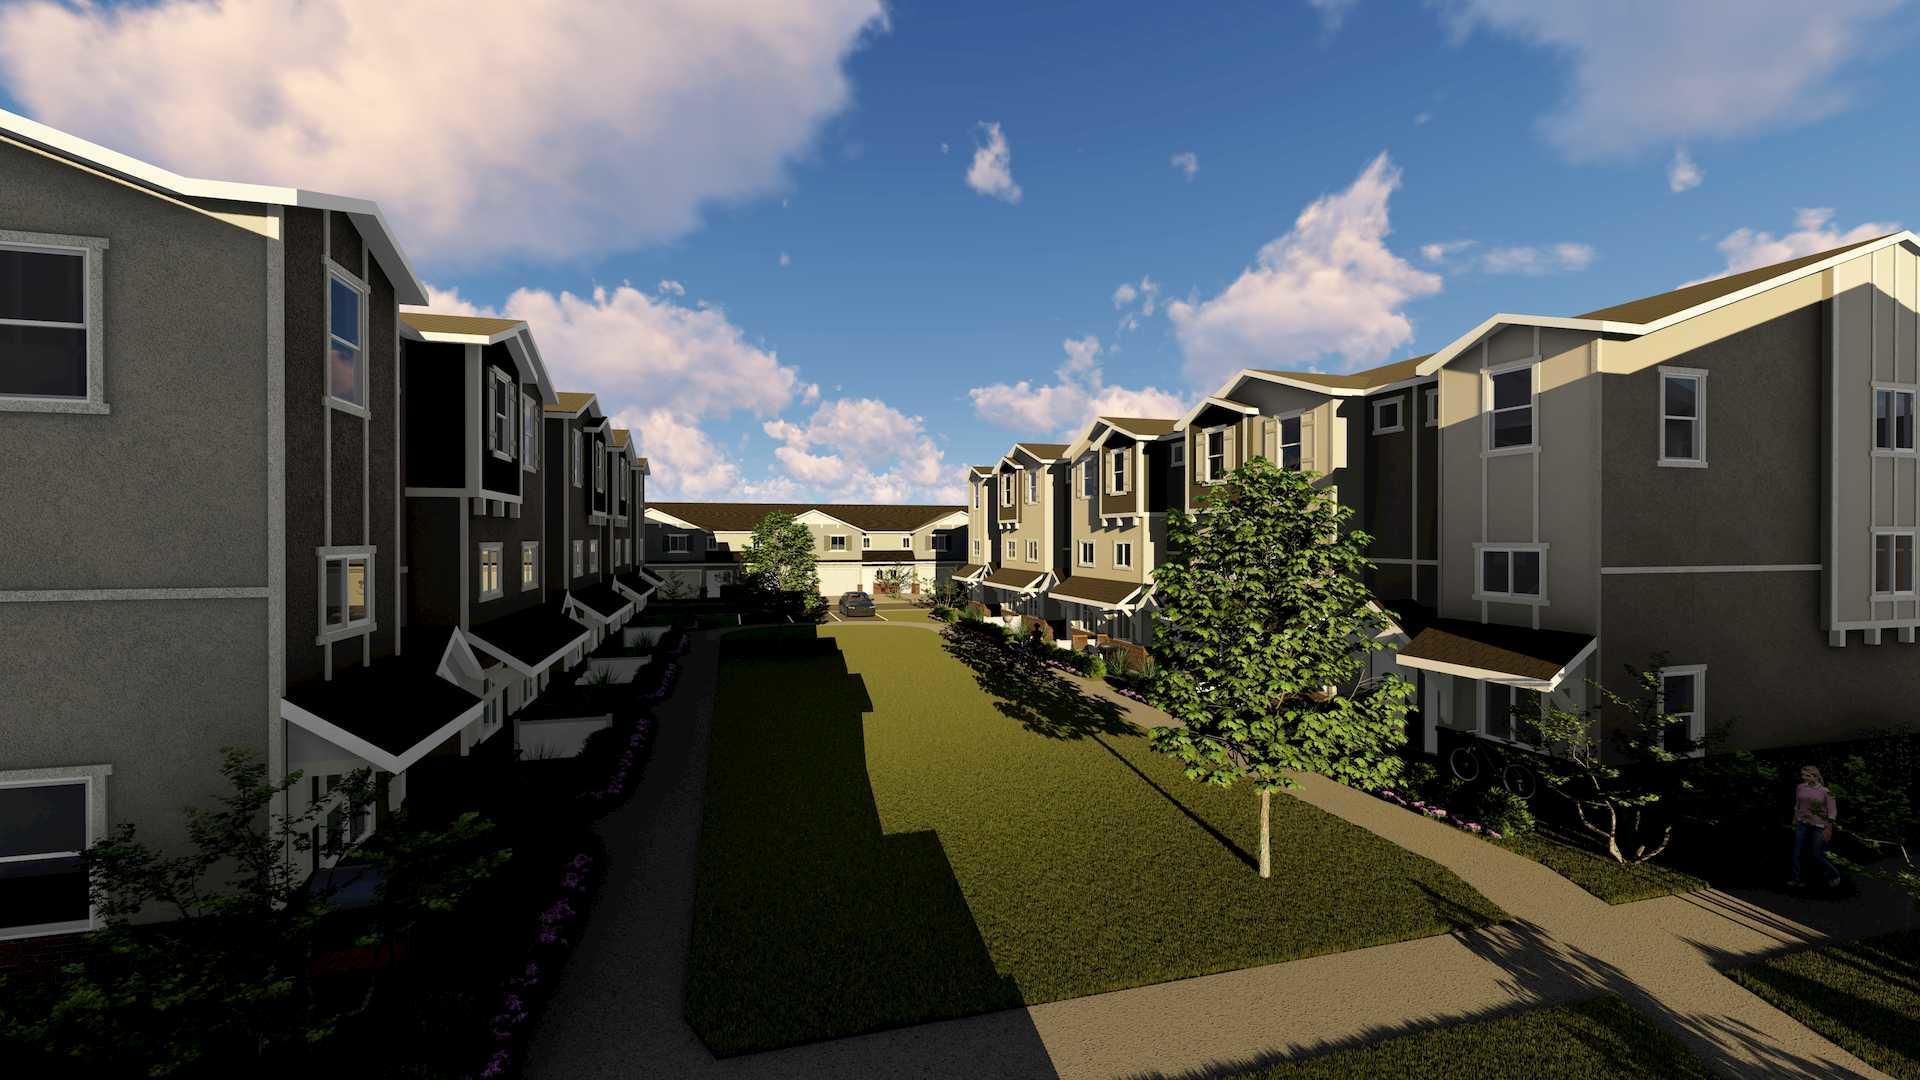 Entrata Farms real estate development in idaho